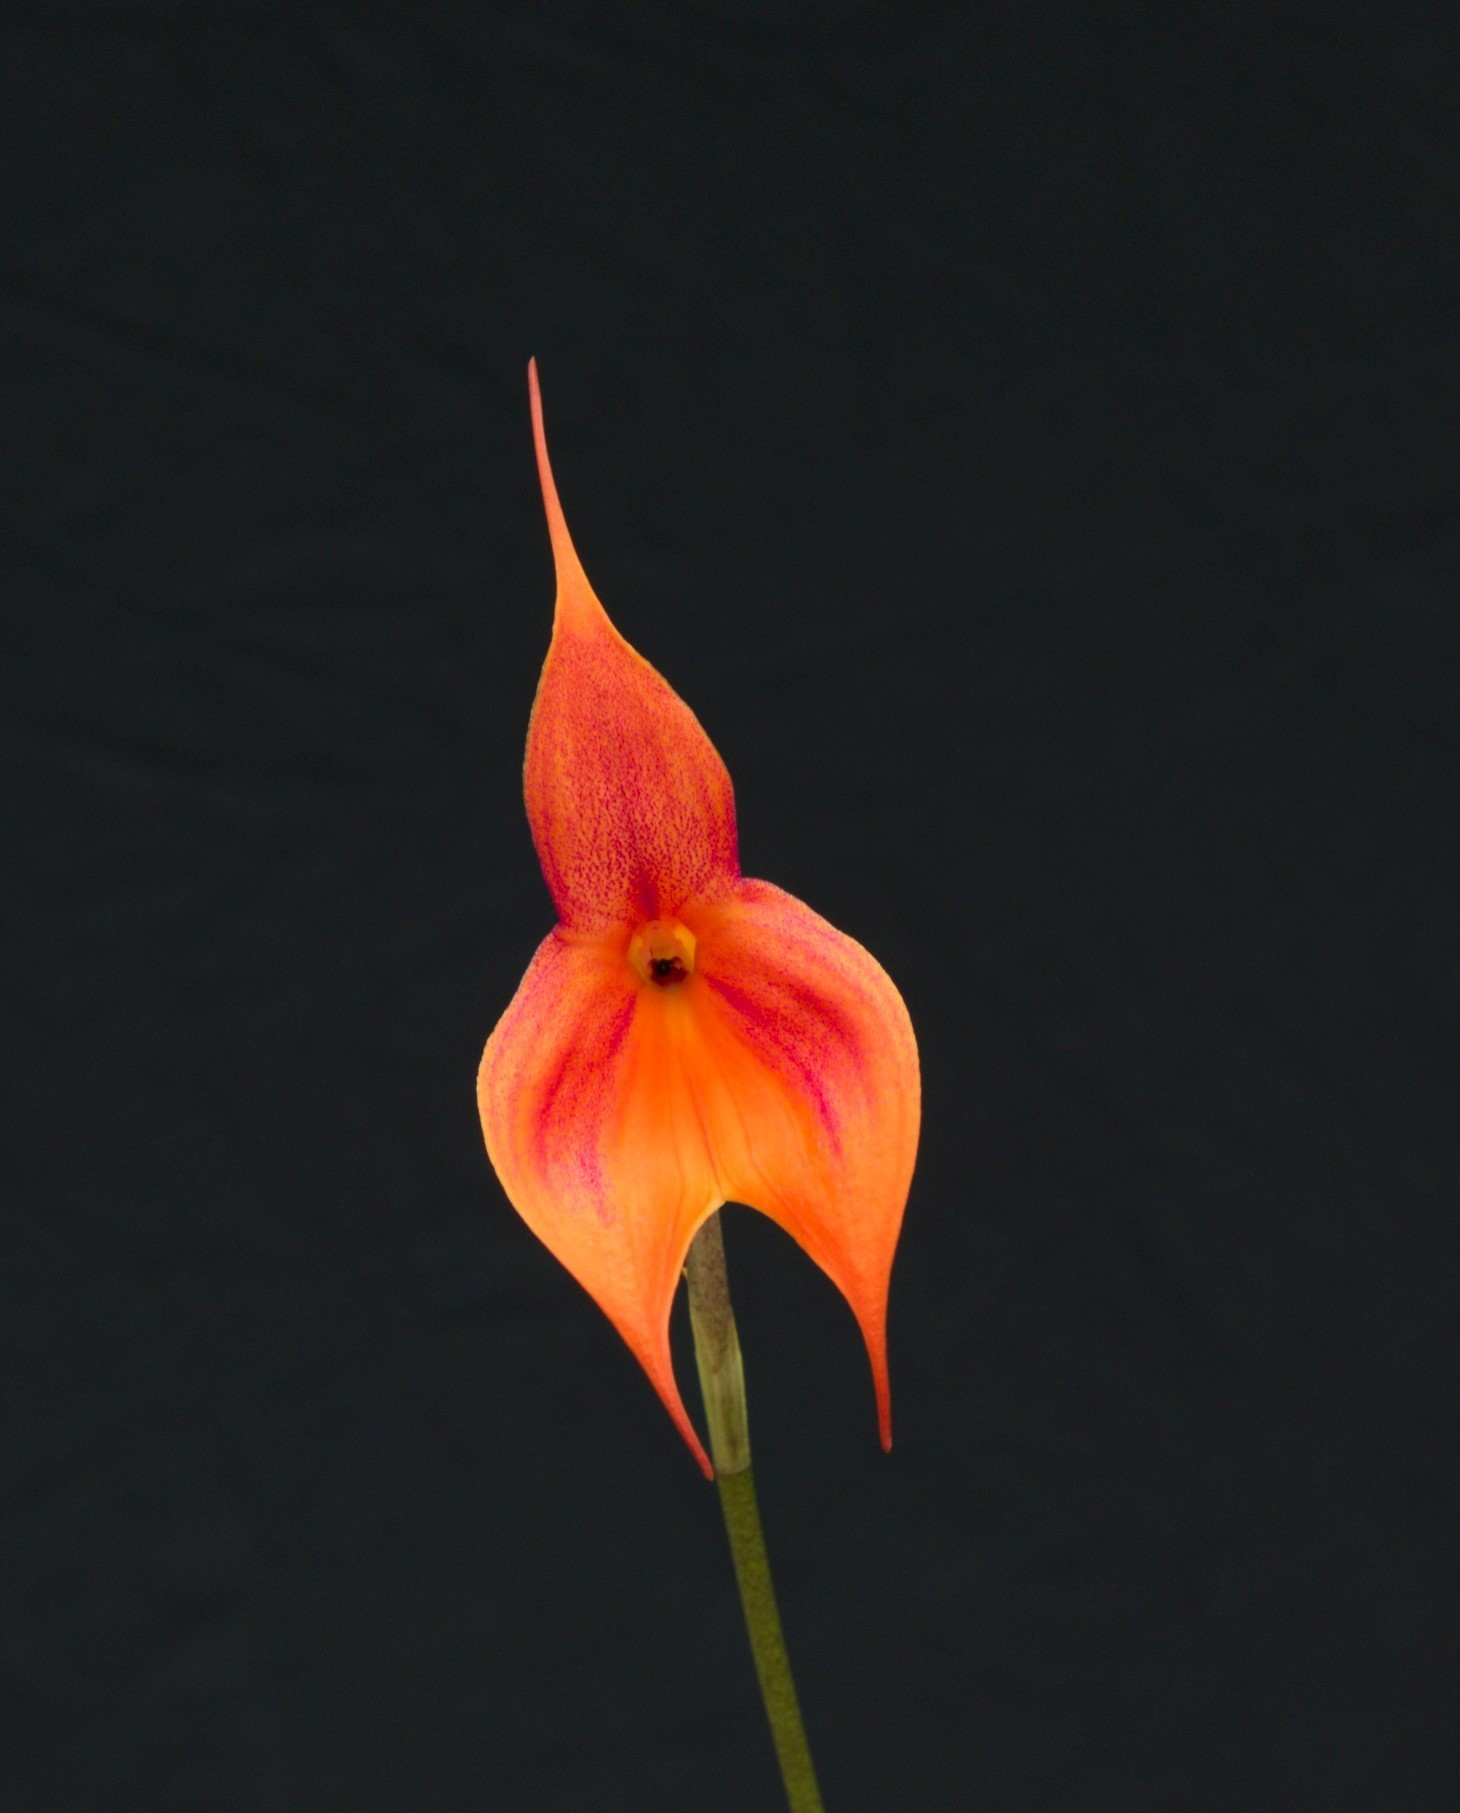 orange-red Masdevallia veitchiana